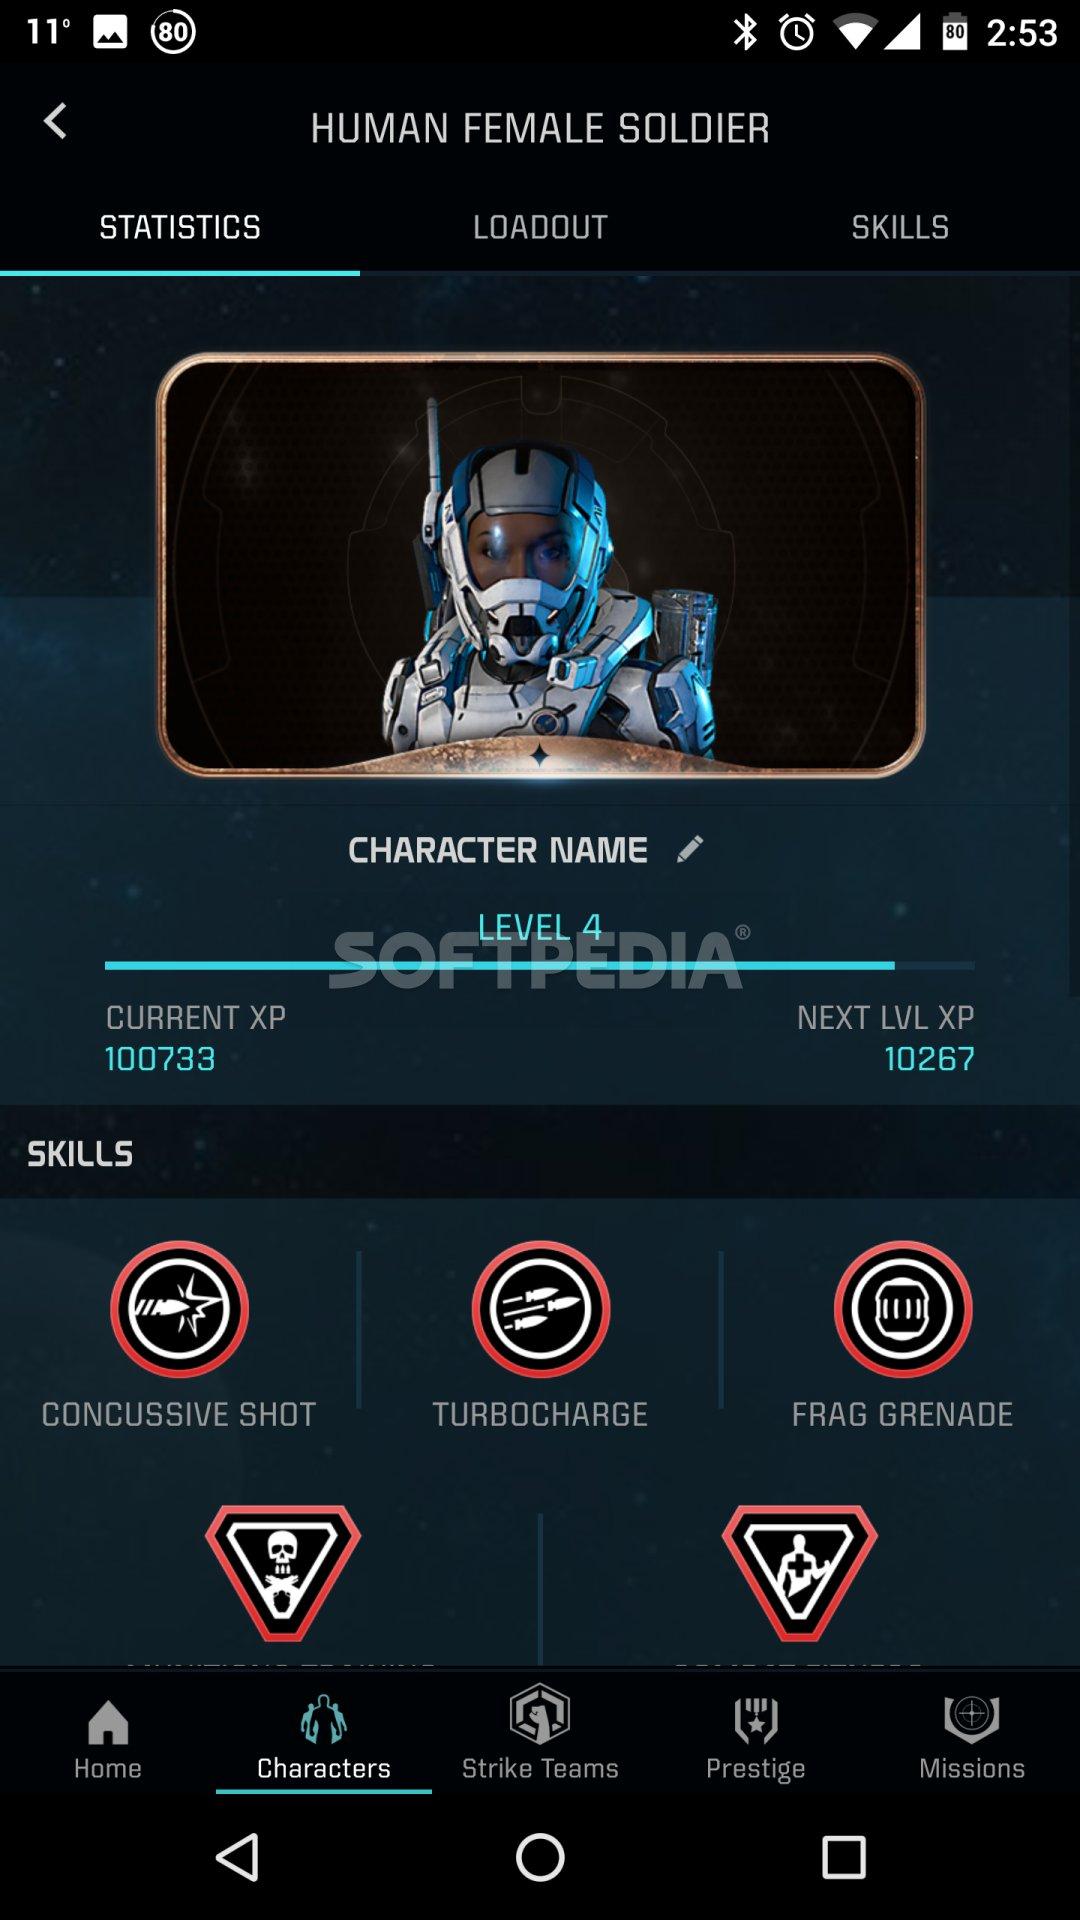 Mass Effect: Andromeda APEX HQ APK Download